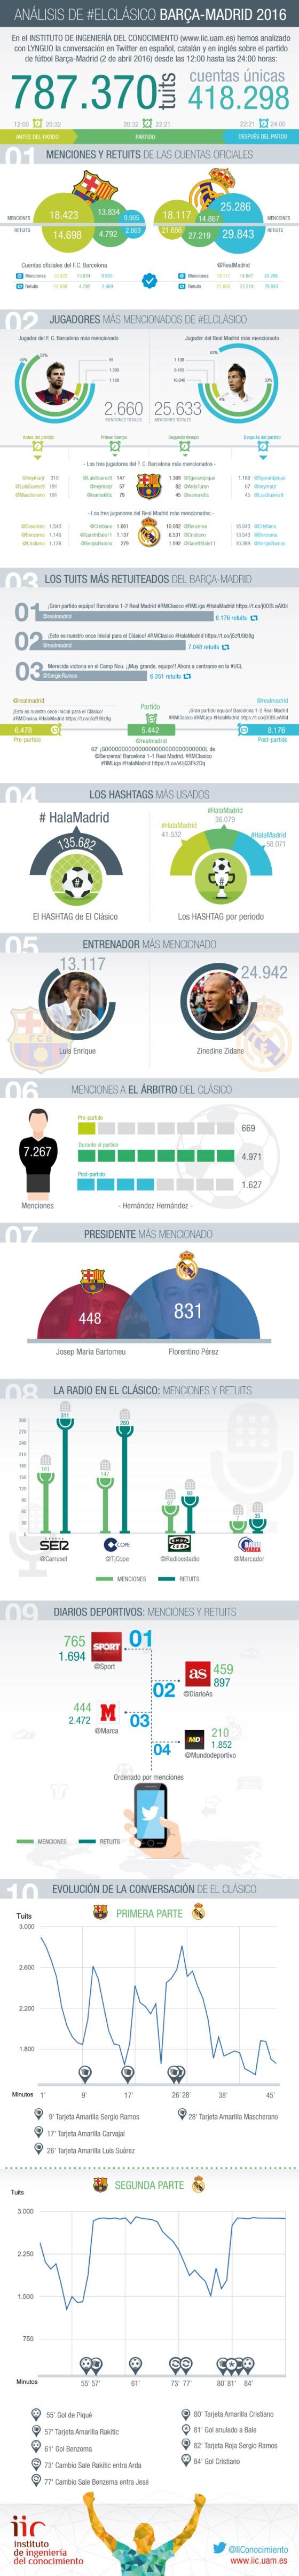 Análisis de partido Barcelona-Real Madrid 2016 en Twitter